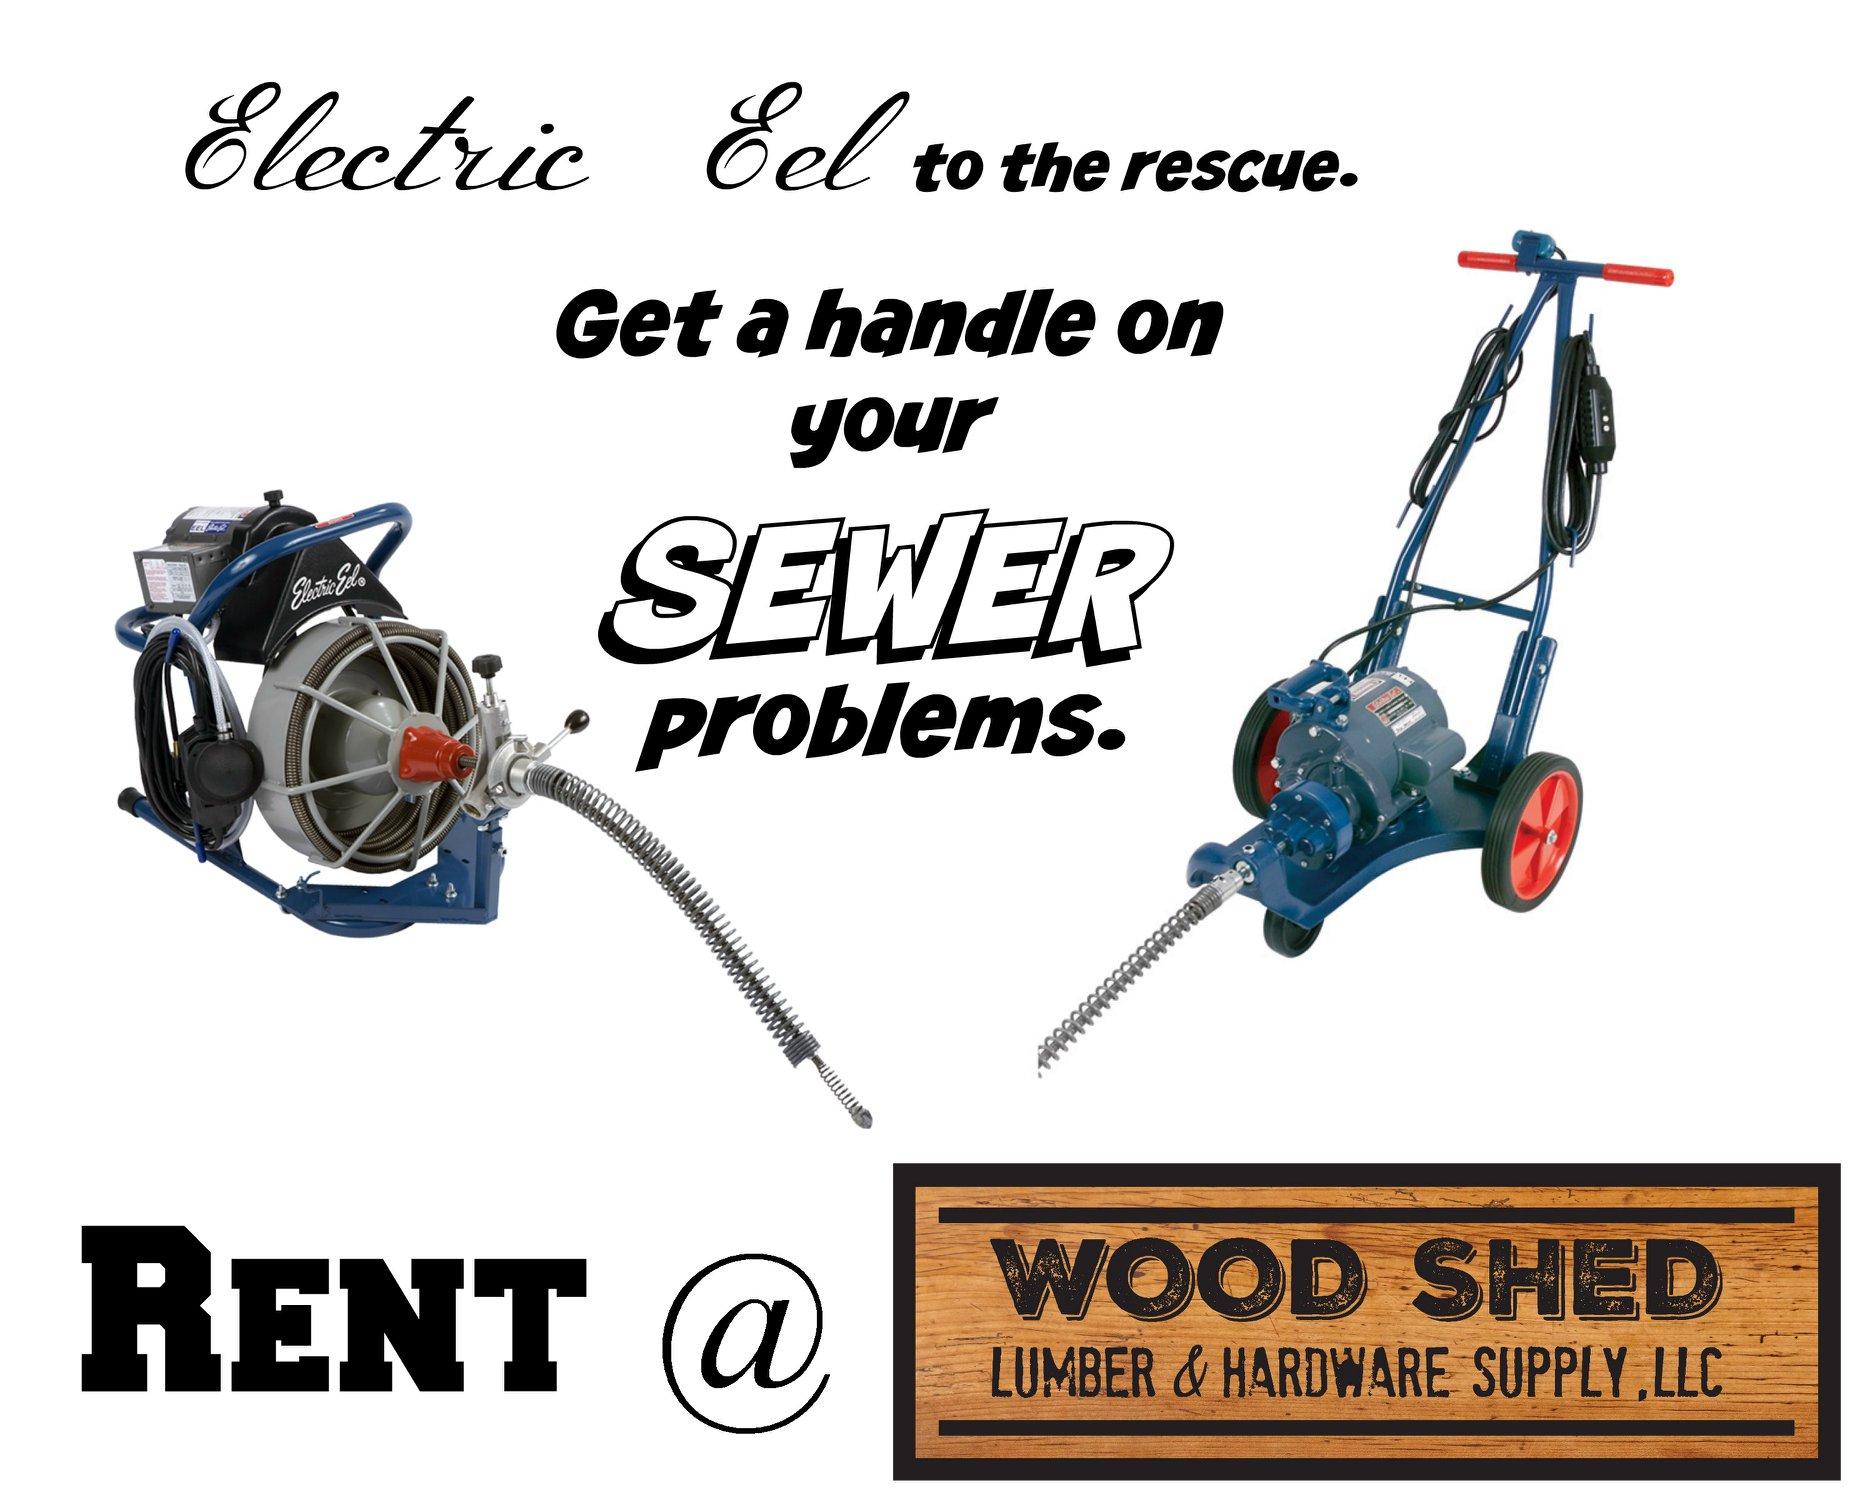 sewer equipment rental